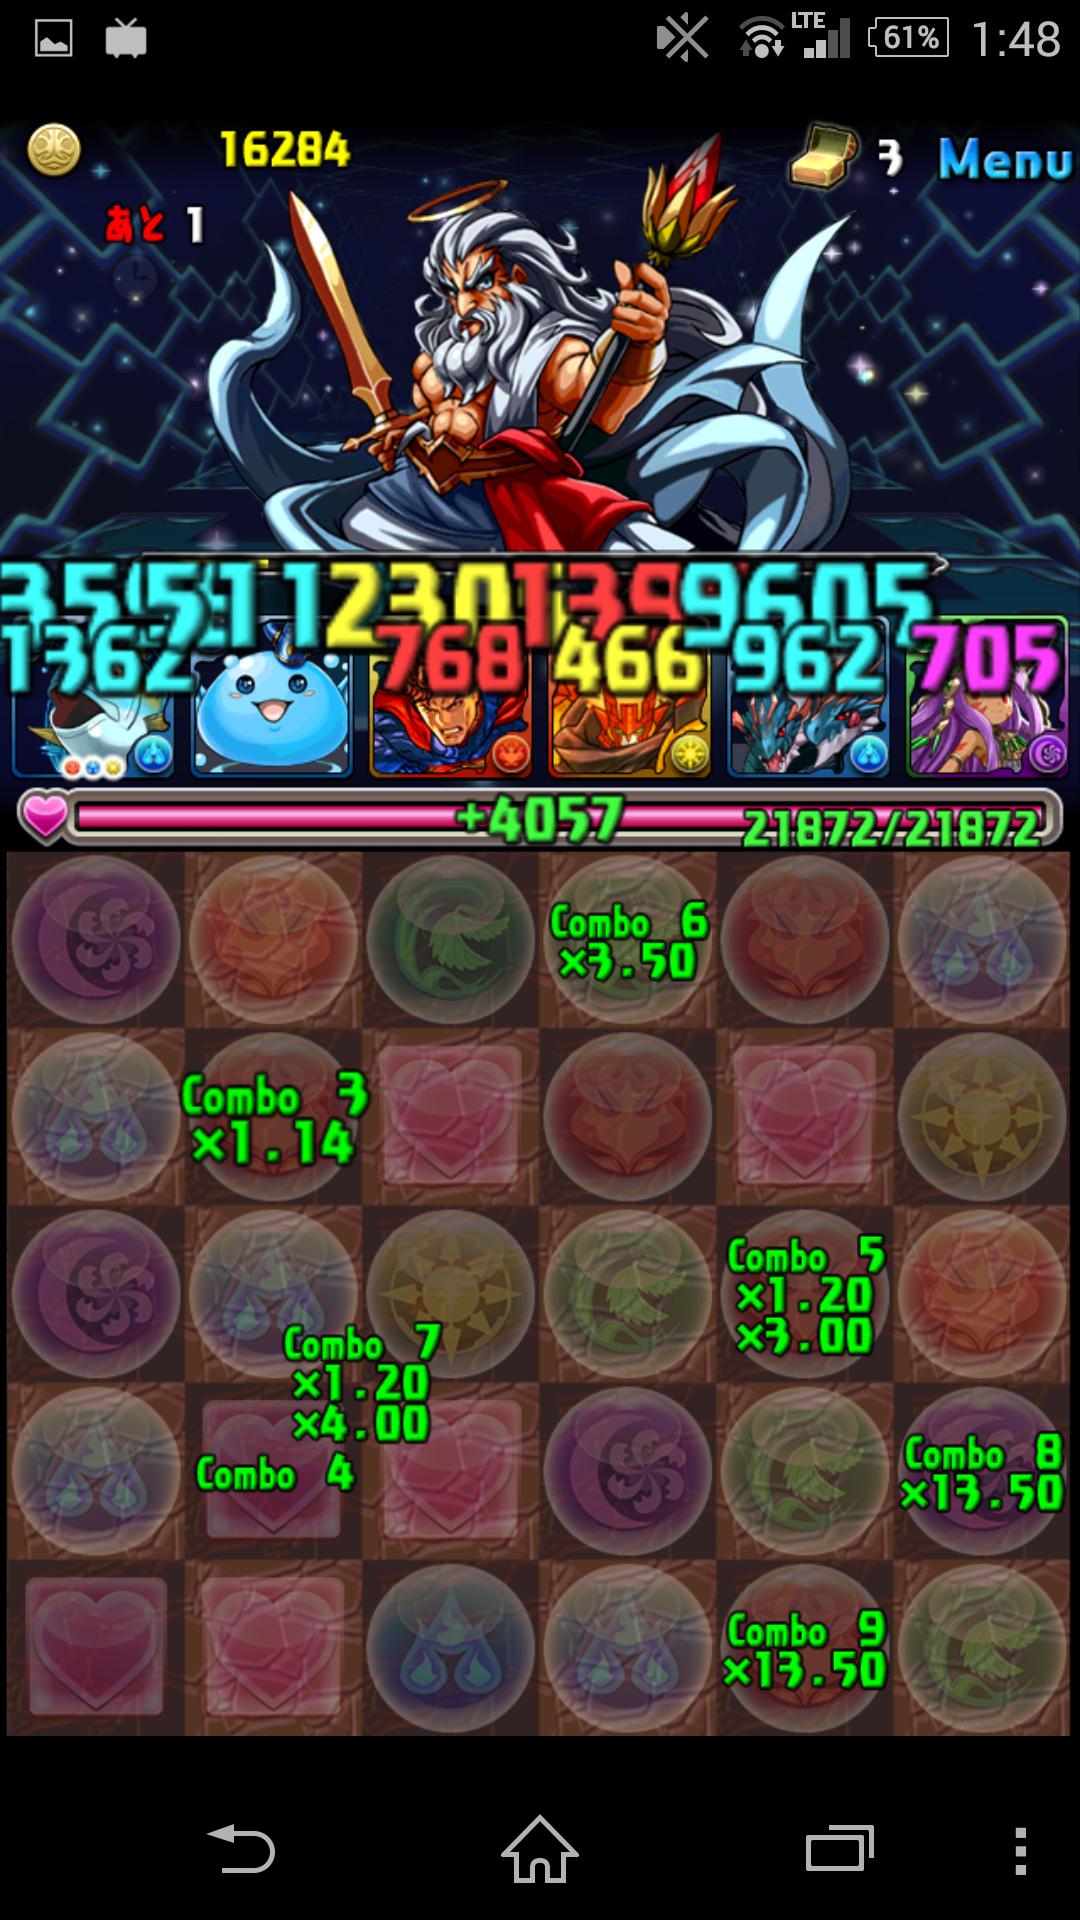 Screenshot_2014-11-13-01-48-43.png